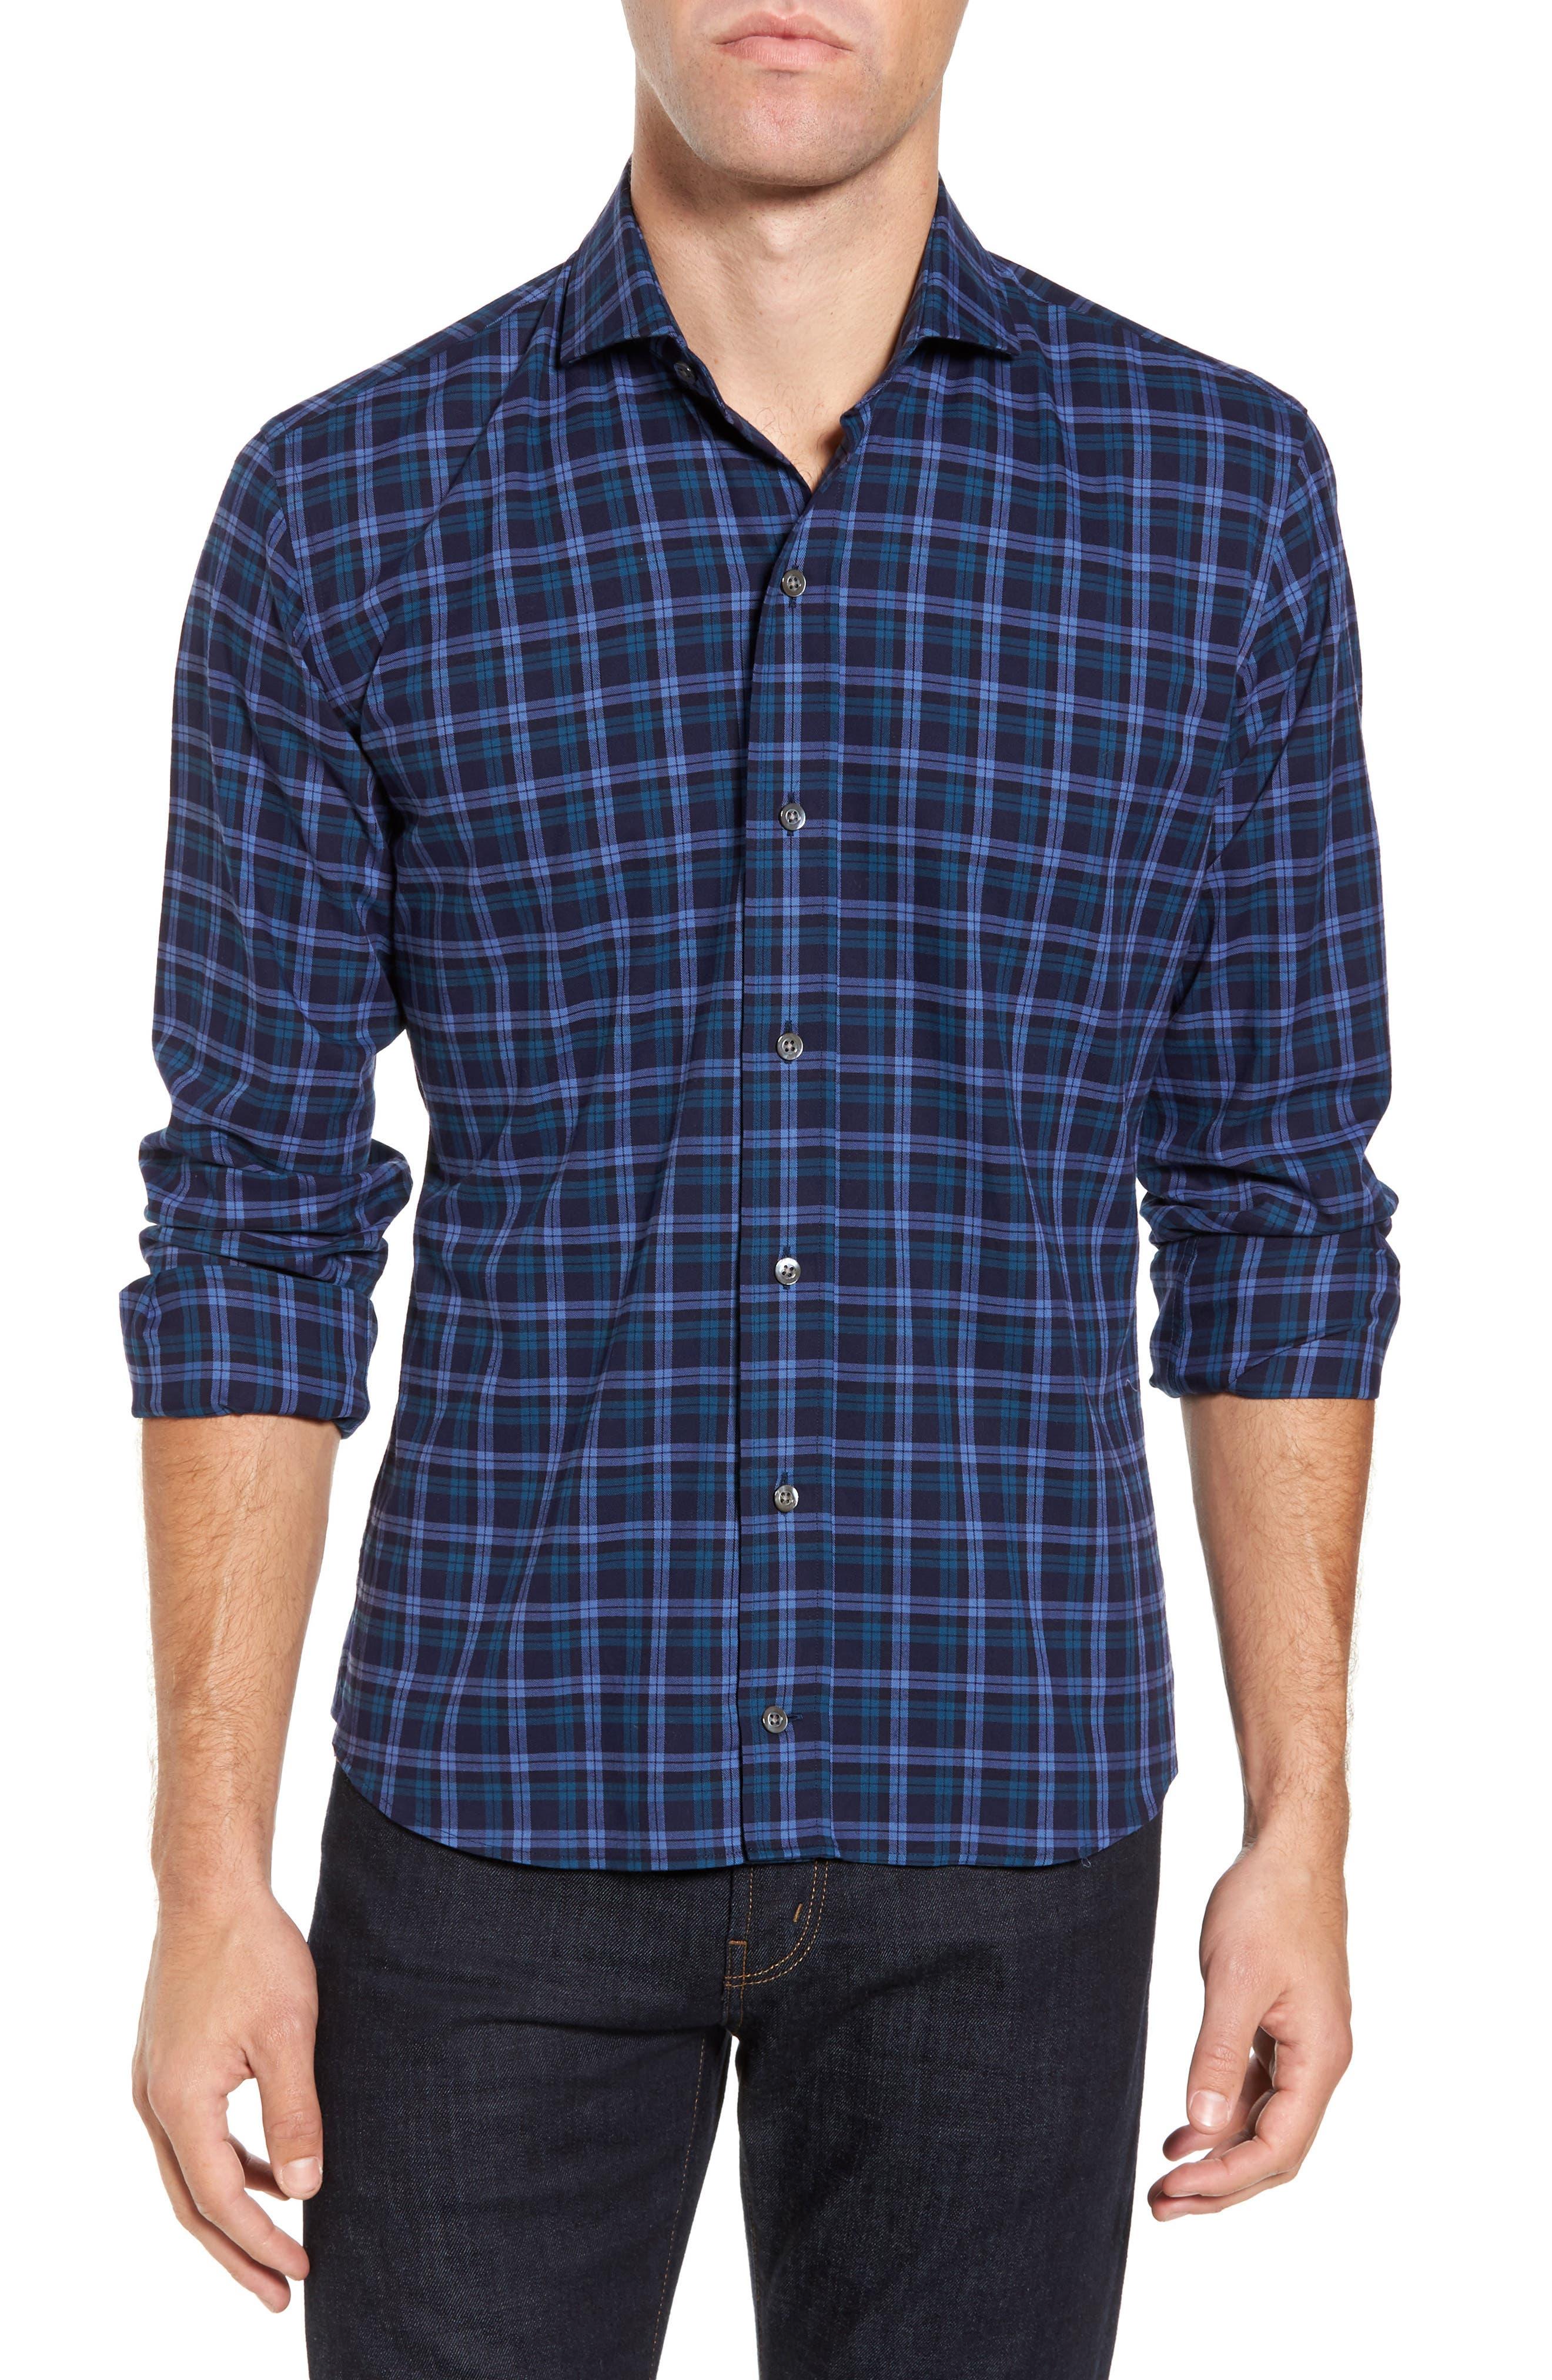 Alternate Image 1 Selected - Ledbury The Blue Goode Slim Fit Plaid Sport Shirt